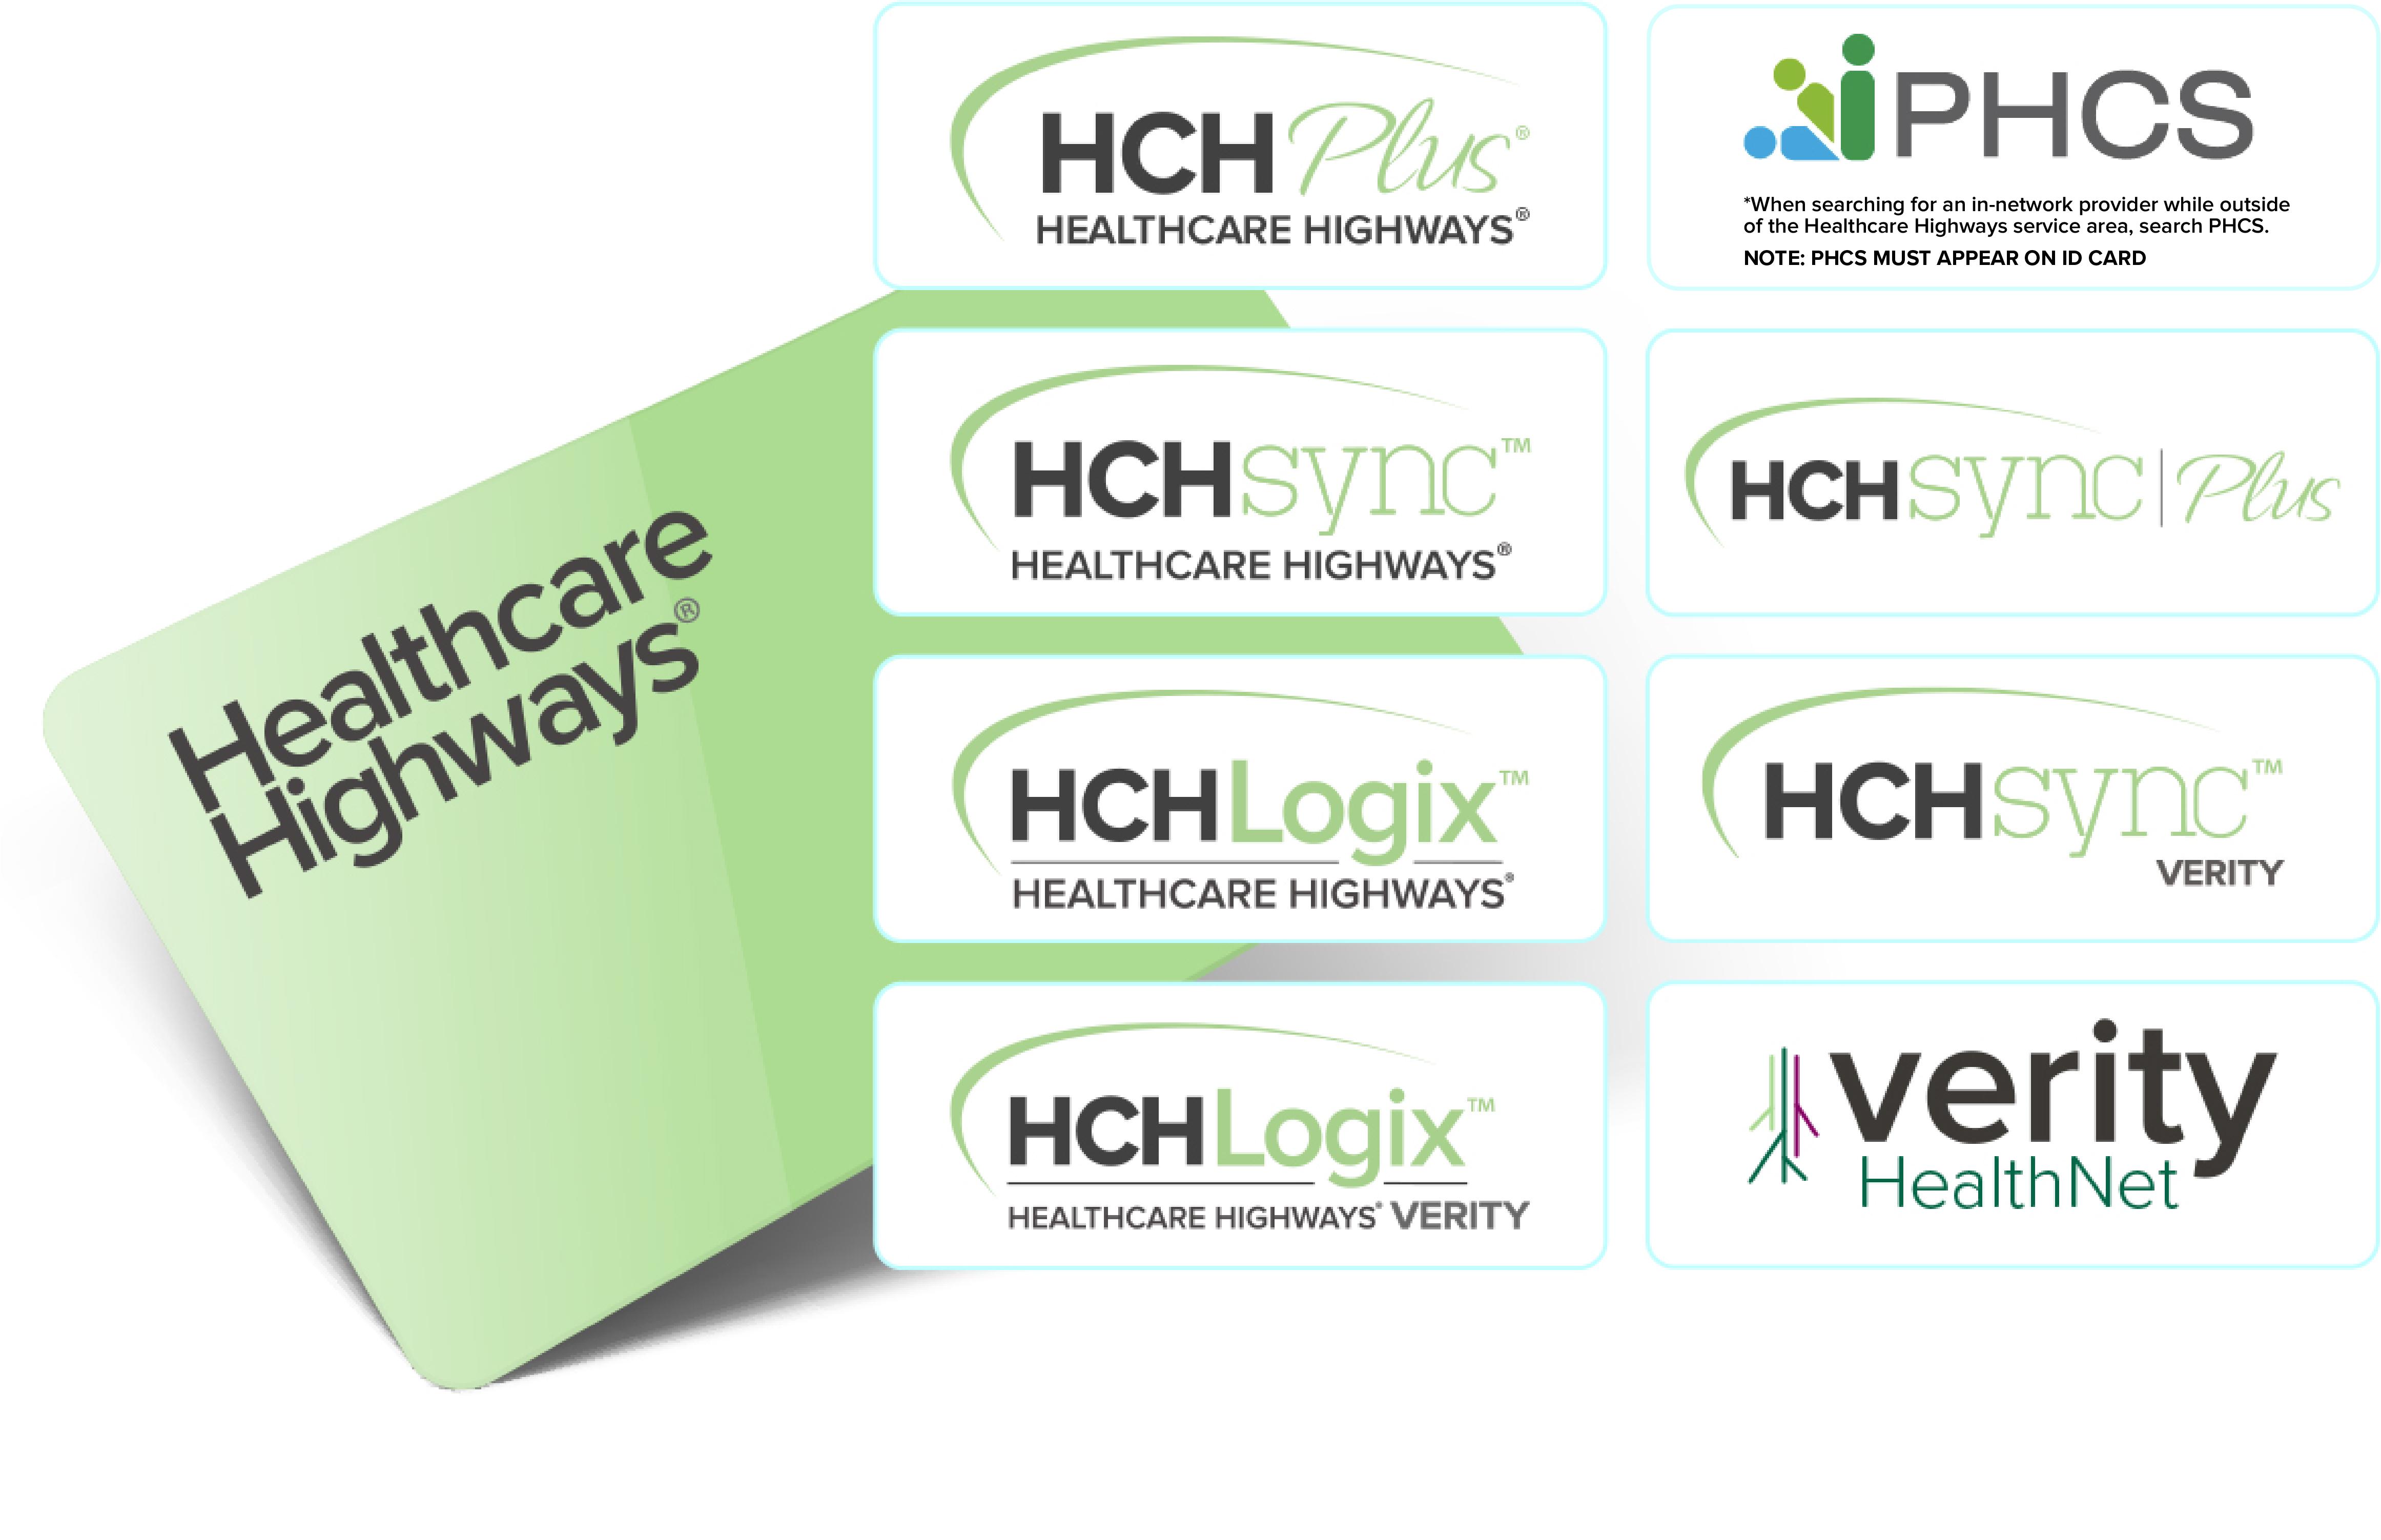 img-providerslogos_PHCS